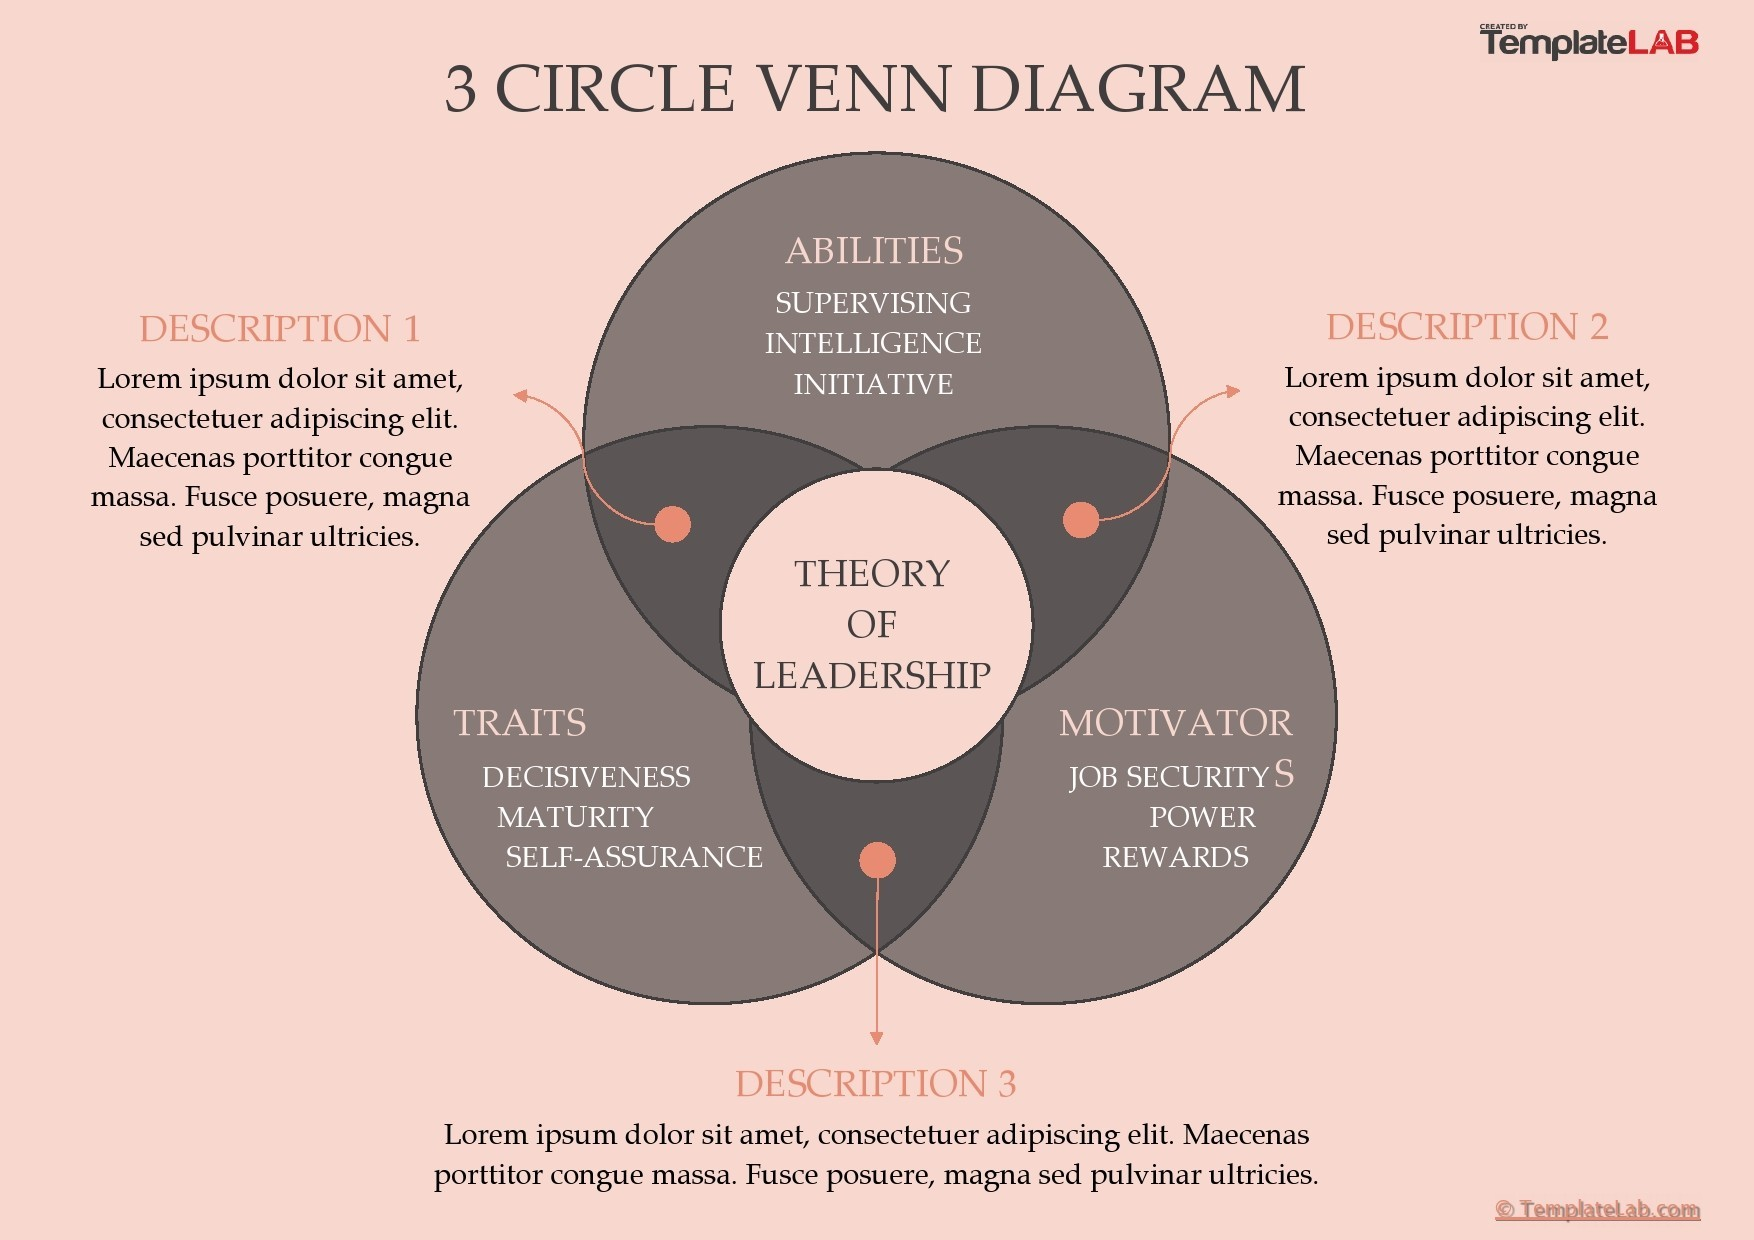 Free 3 Circle Venn Diagram Template 03 - TemplateLab.com